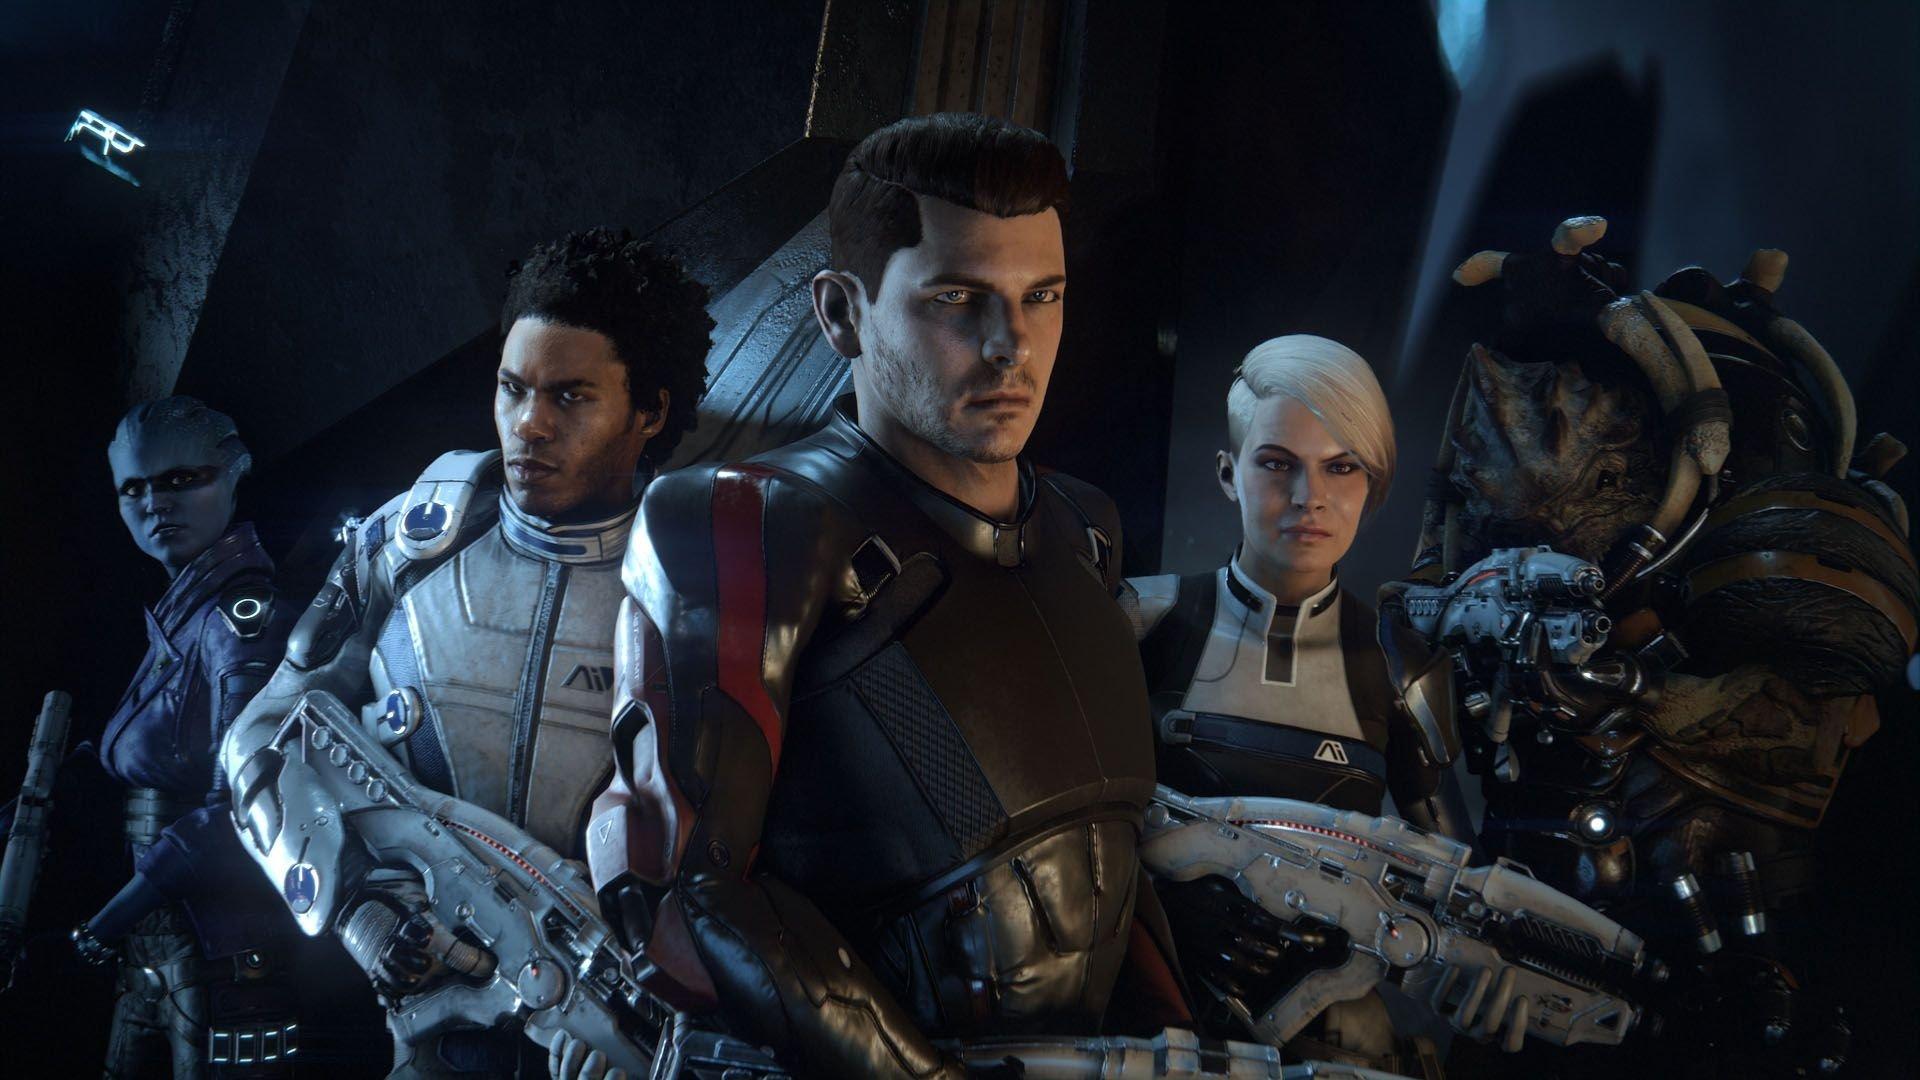 Mass Effect: Andromeda image 8